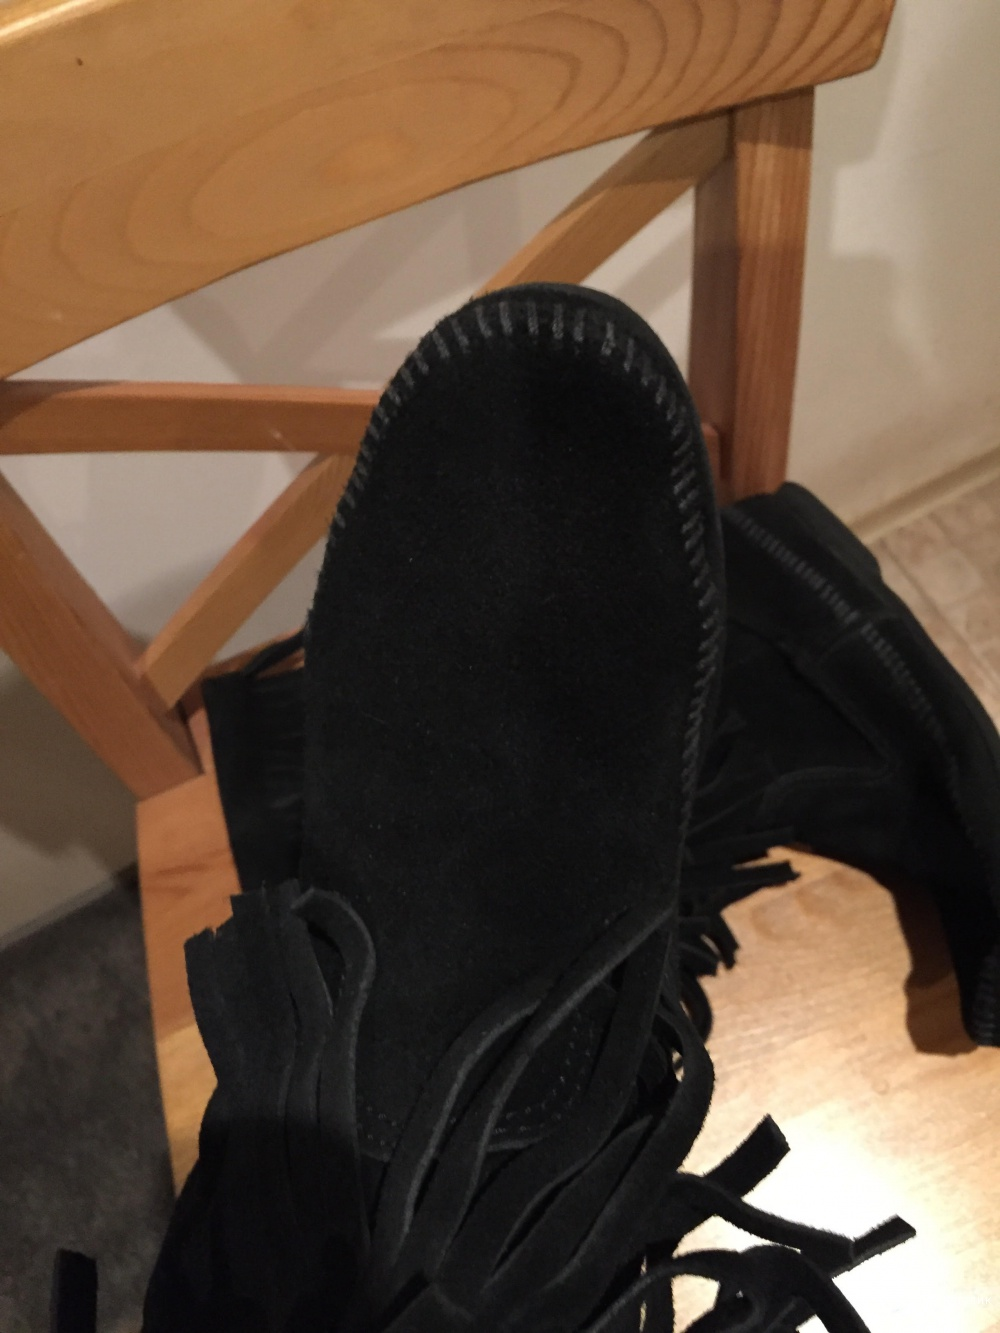 Сапоги MINNETONKA черные, замша с бахромой, размер 8US.